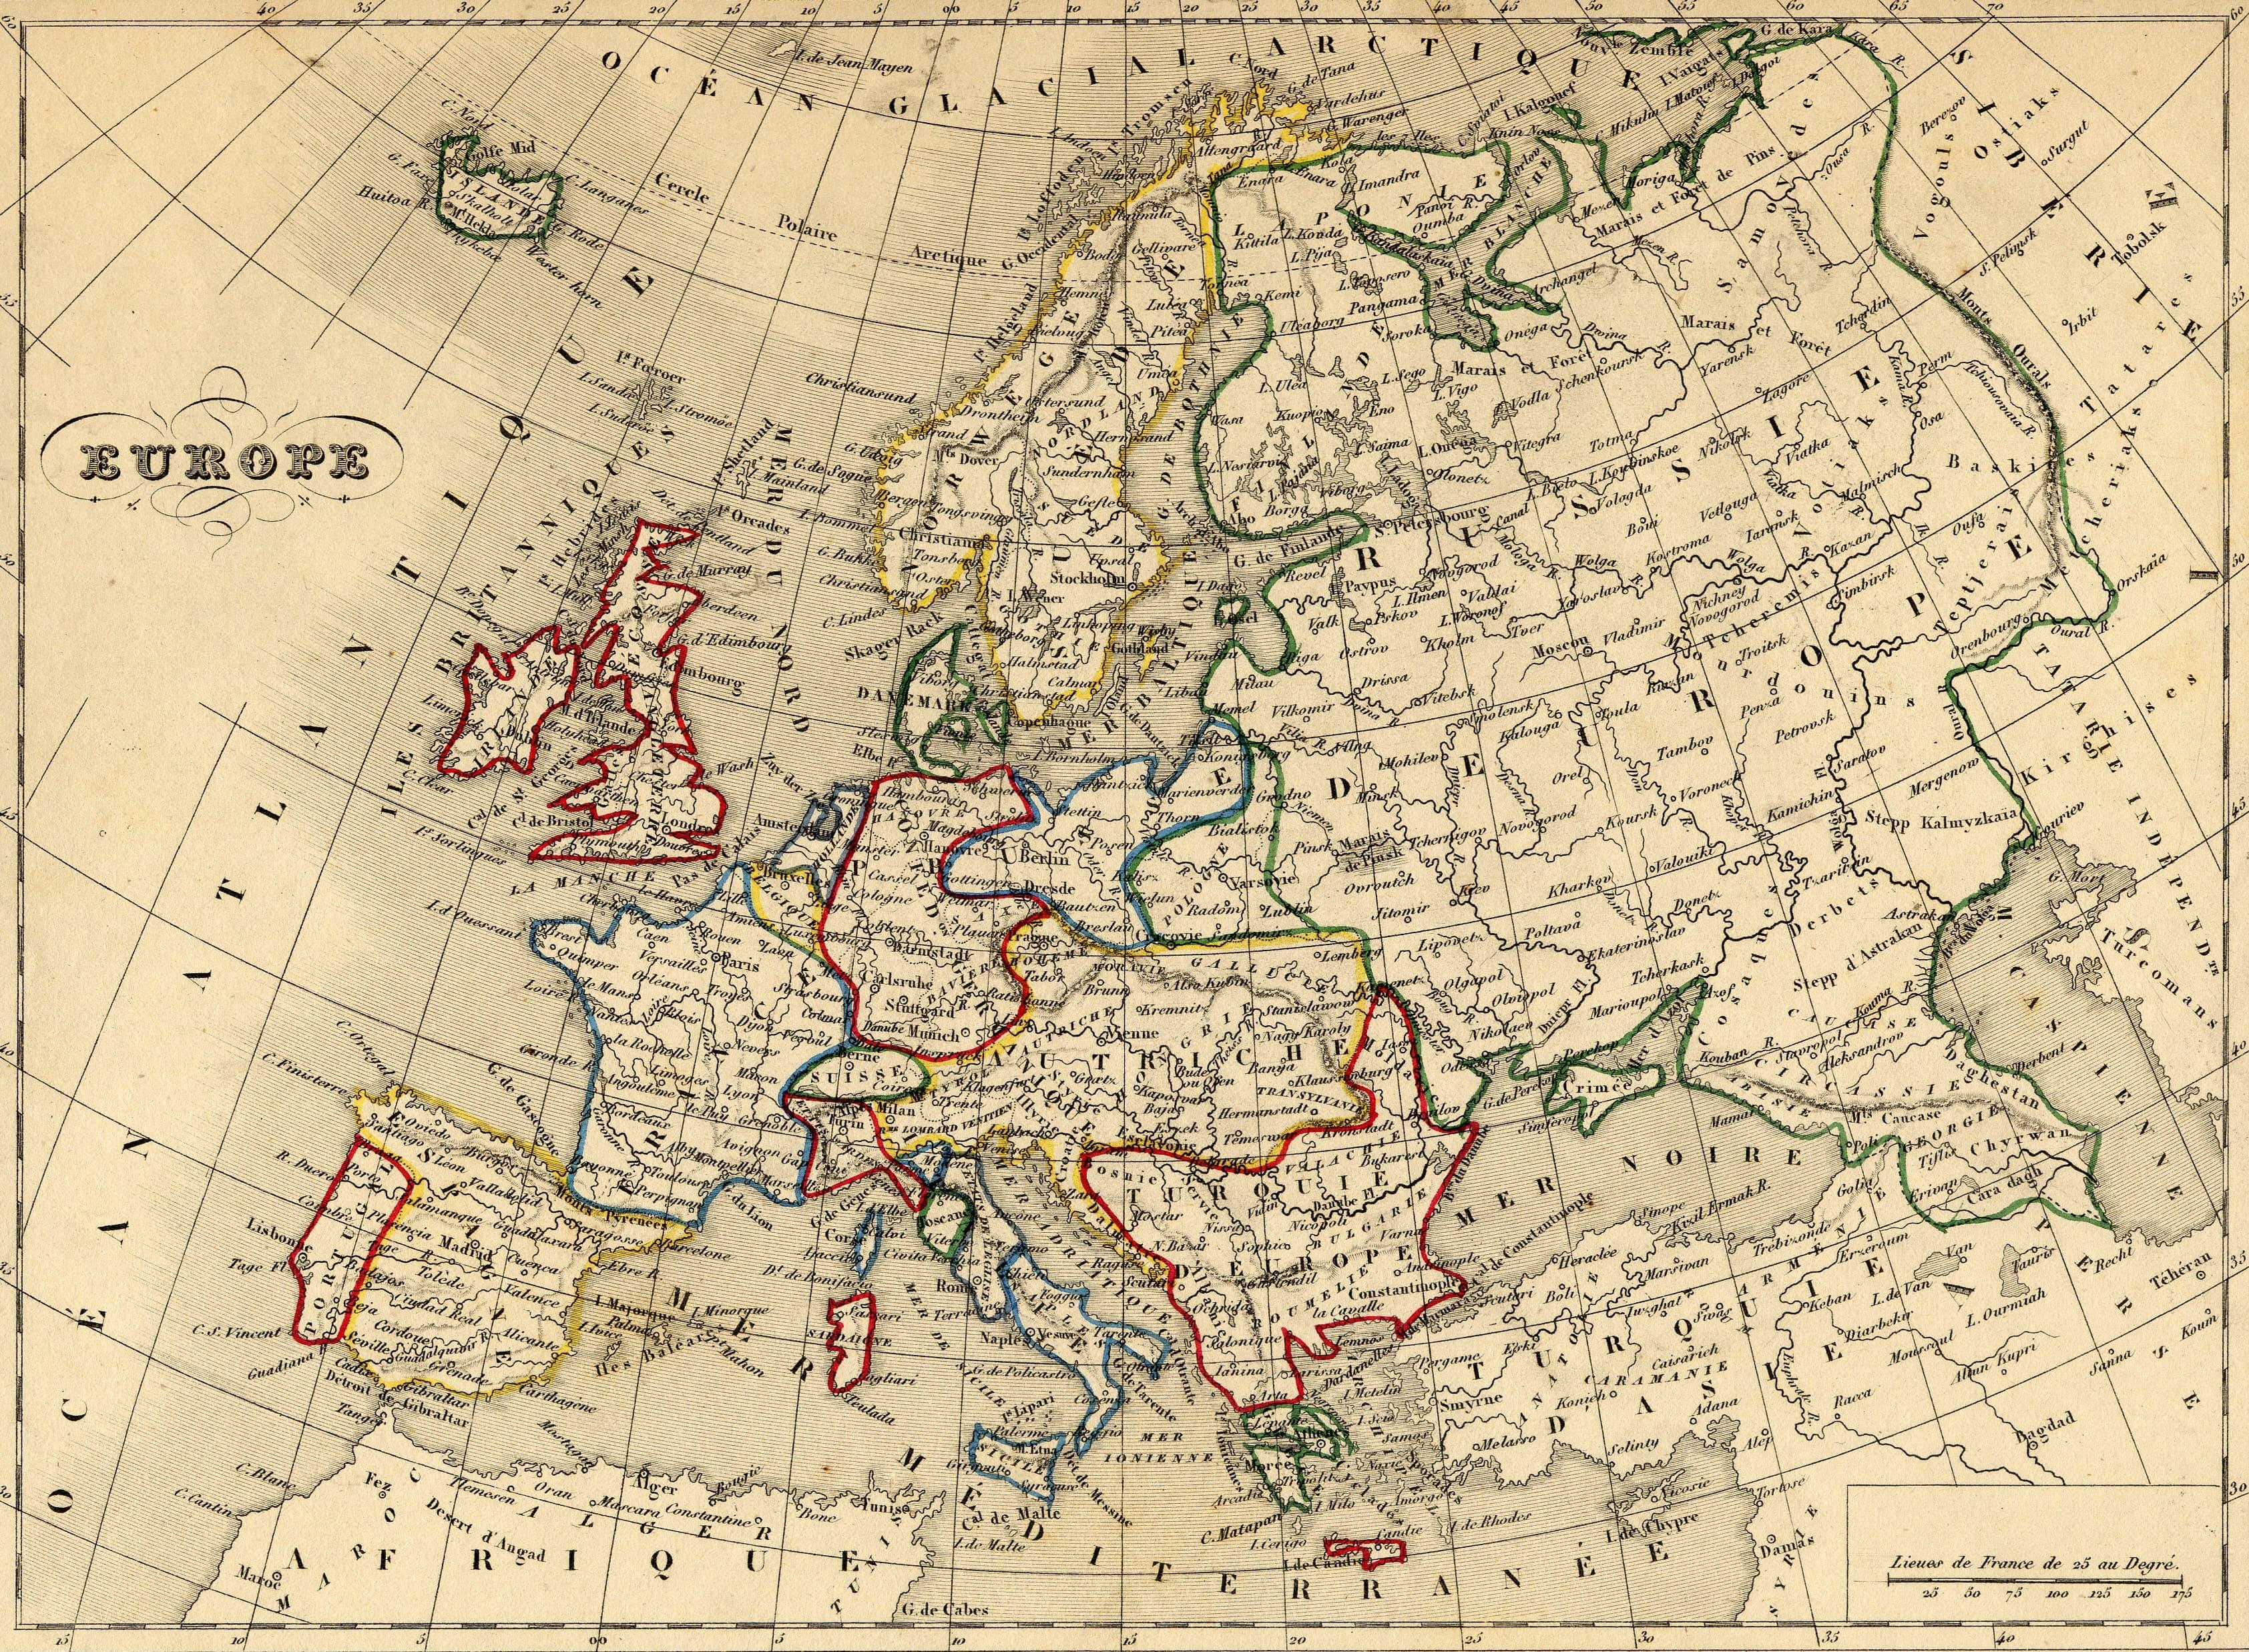 carte europe 1800